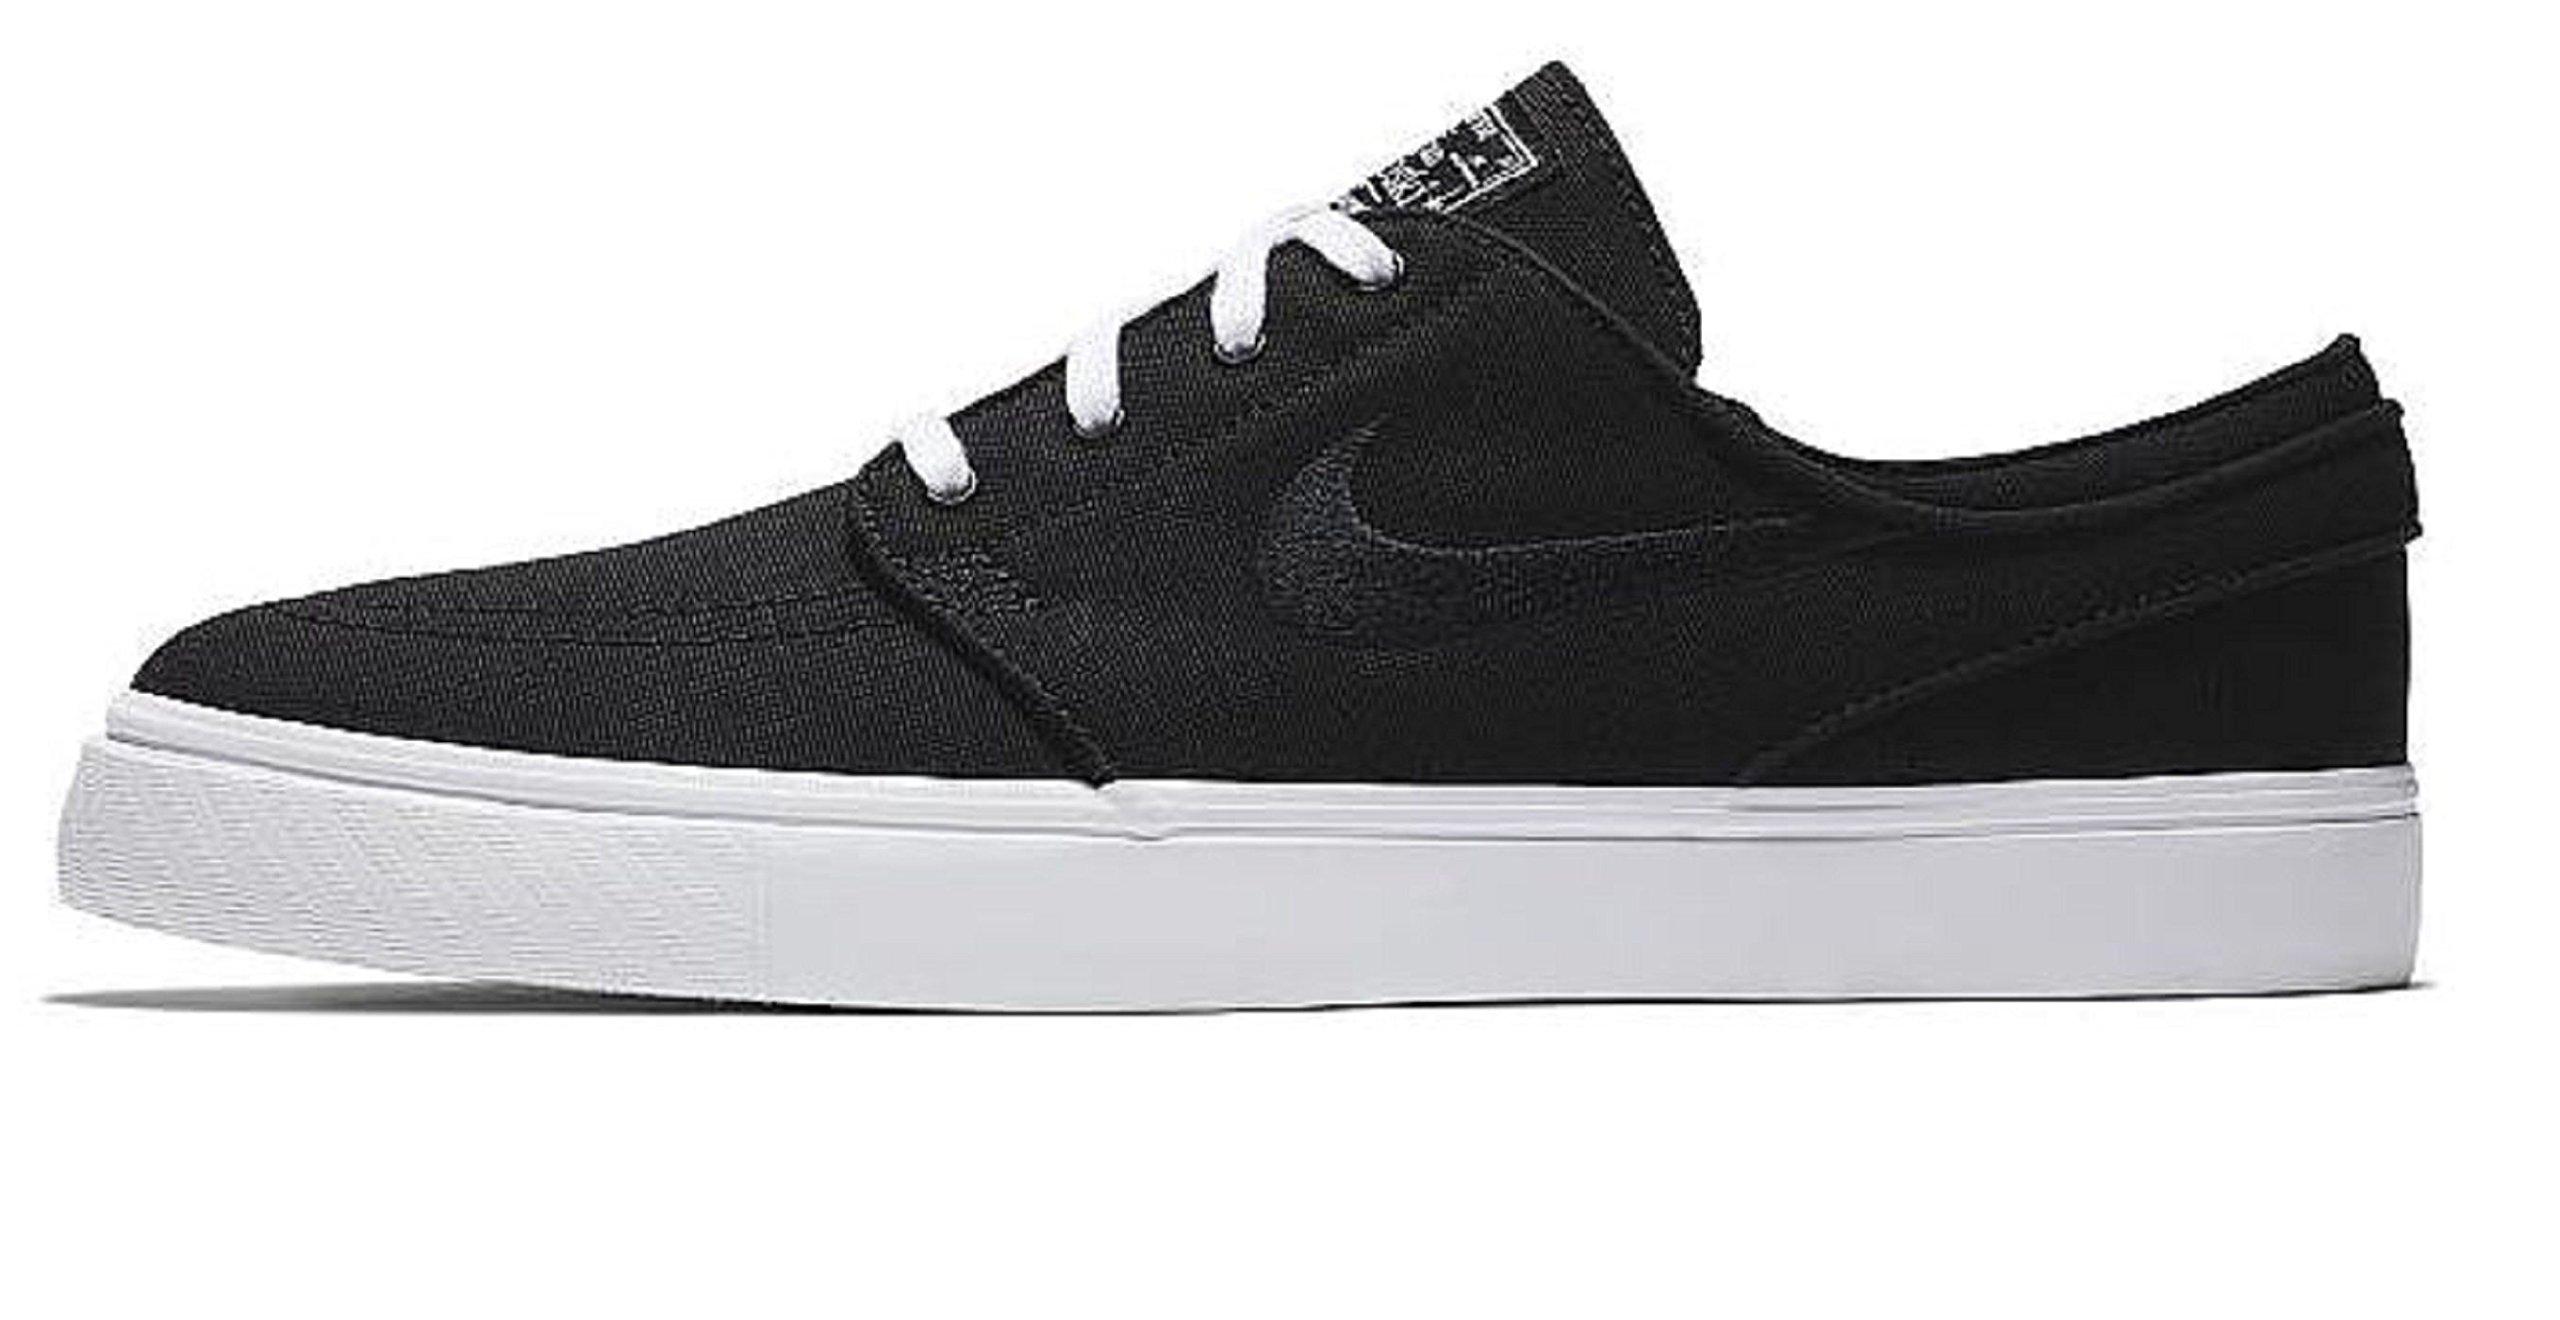 on sale 33bd6 da375 Galleon - NIKE Zoom Stefan Janoski CNVS Mens Skateboarding-Shoes 615957-022 14  - Black Black-White